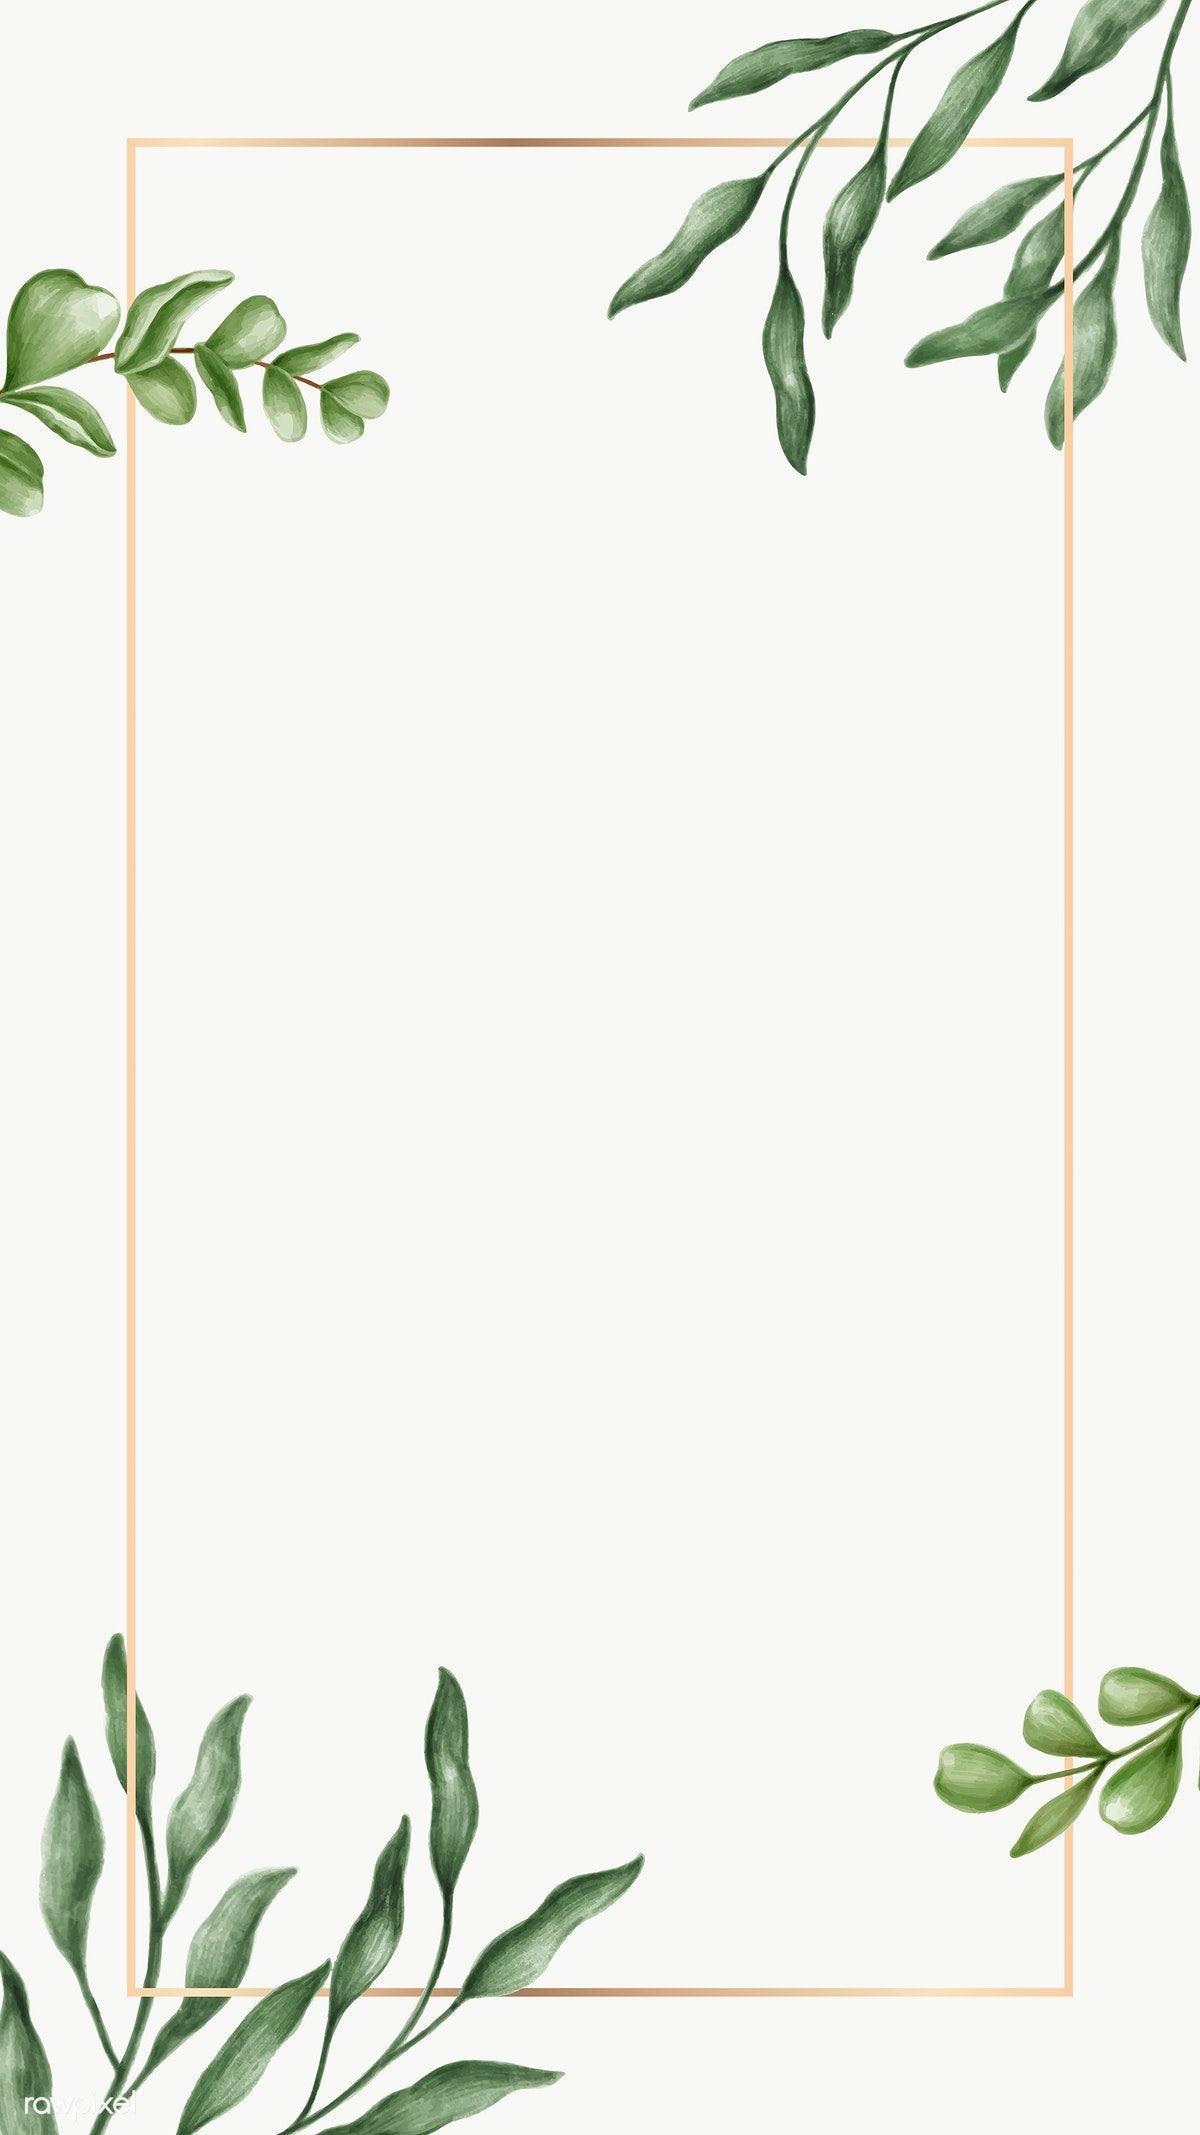 Download Premium Png Of Green Leaves Frame Transparent Png 2032819 In 2020 Flower Background Wallpaper Gold Wallpaper Background Floral Border Design